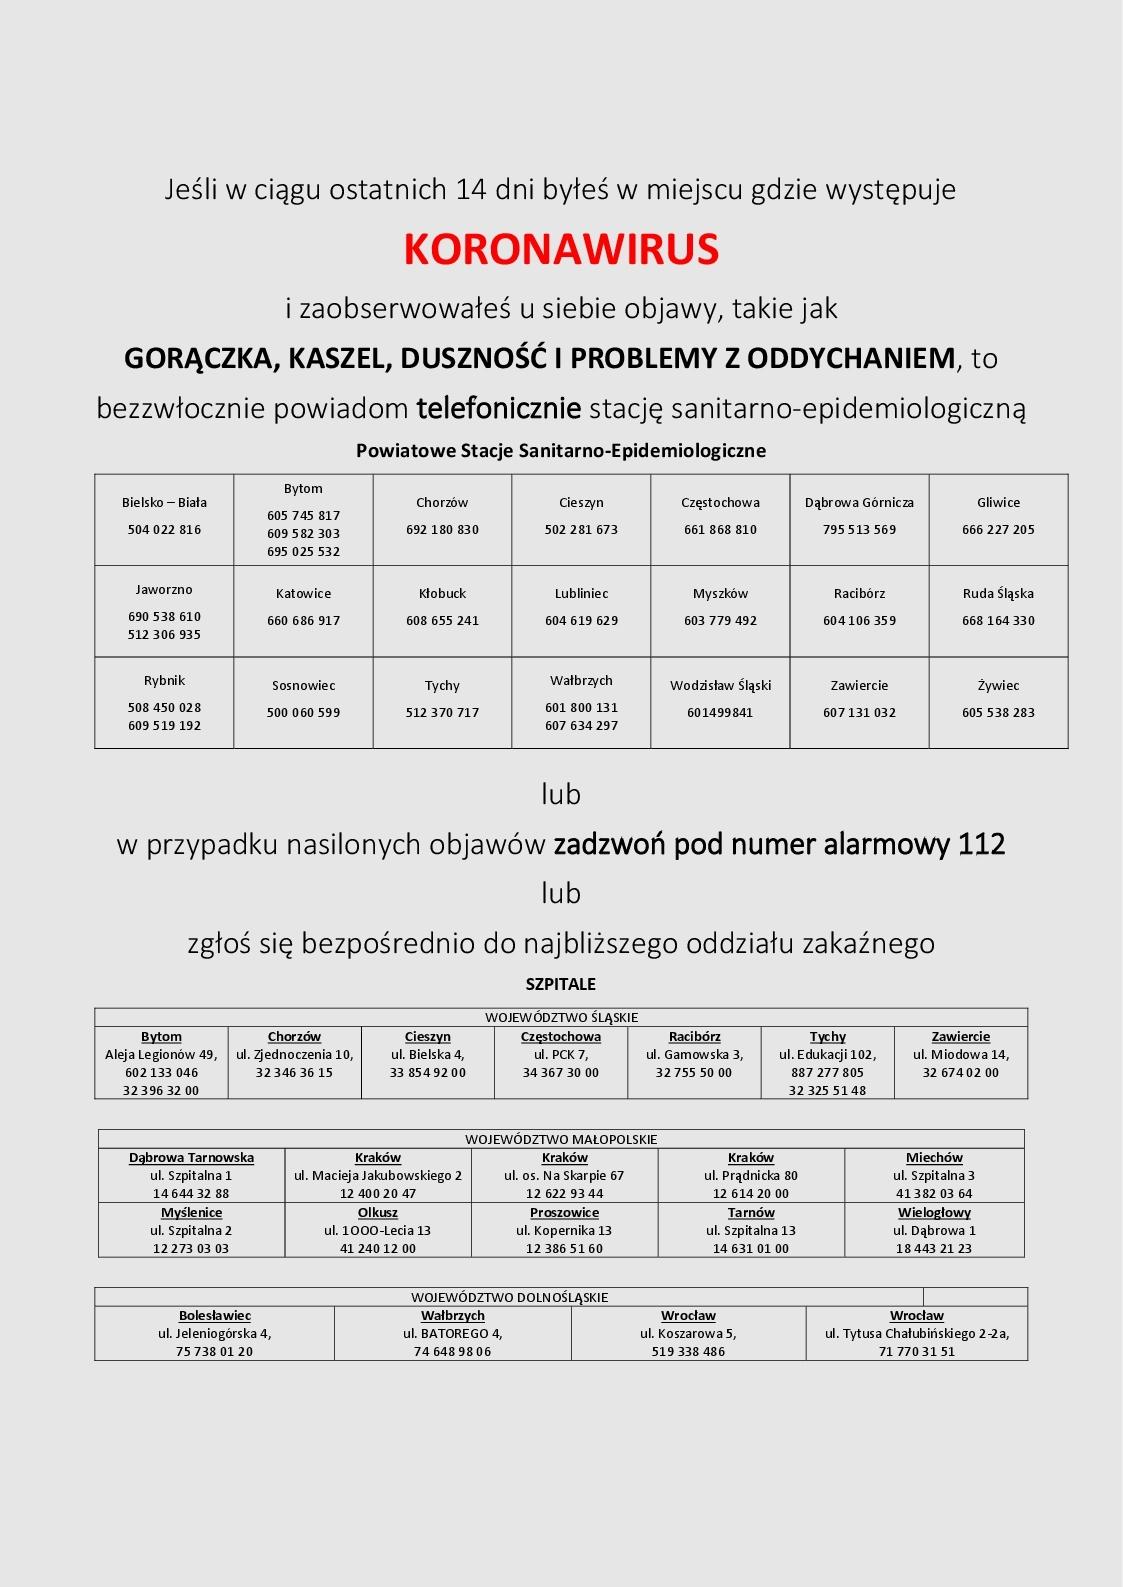 koronawirus - plakat